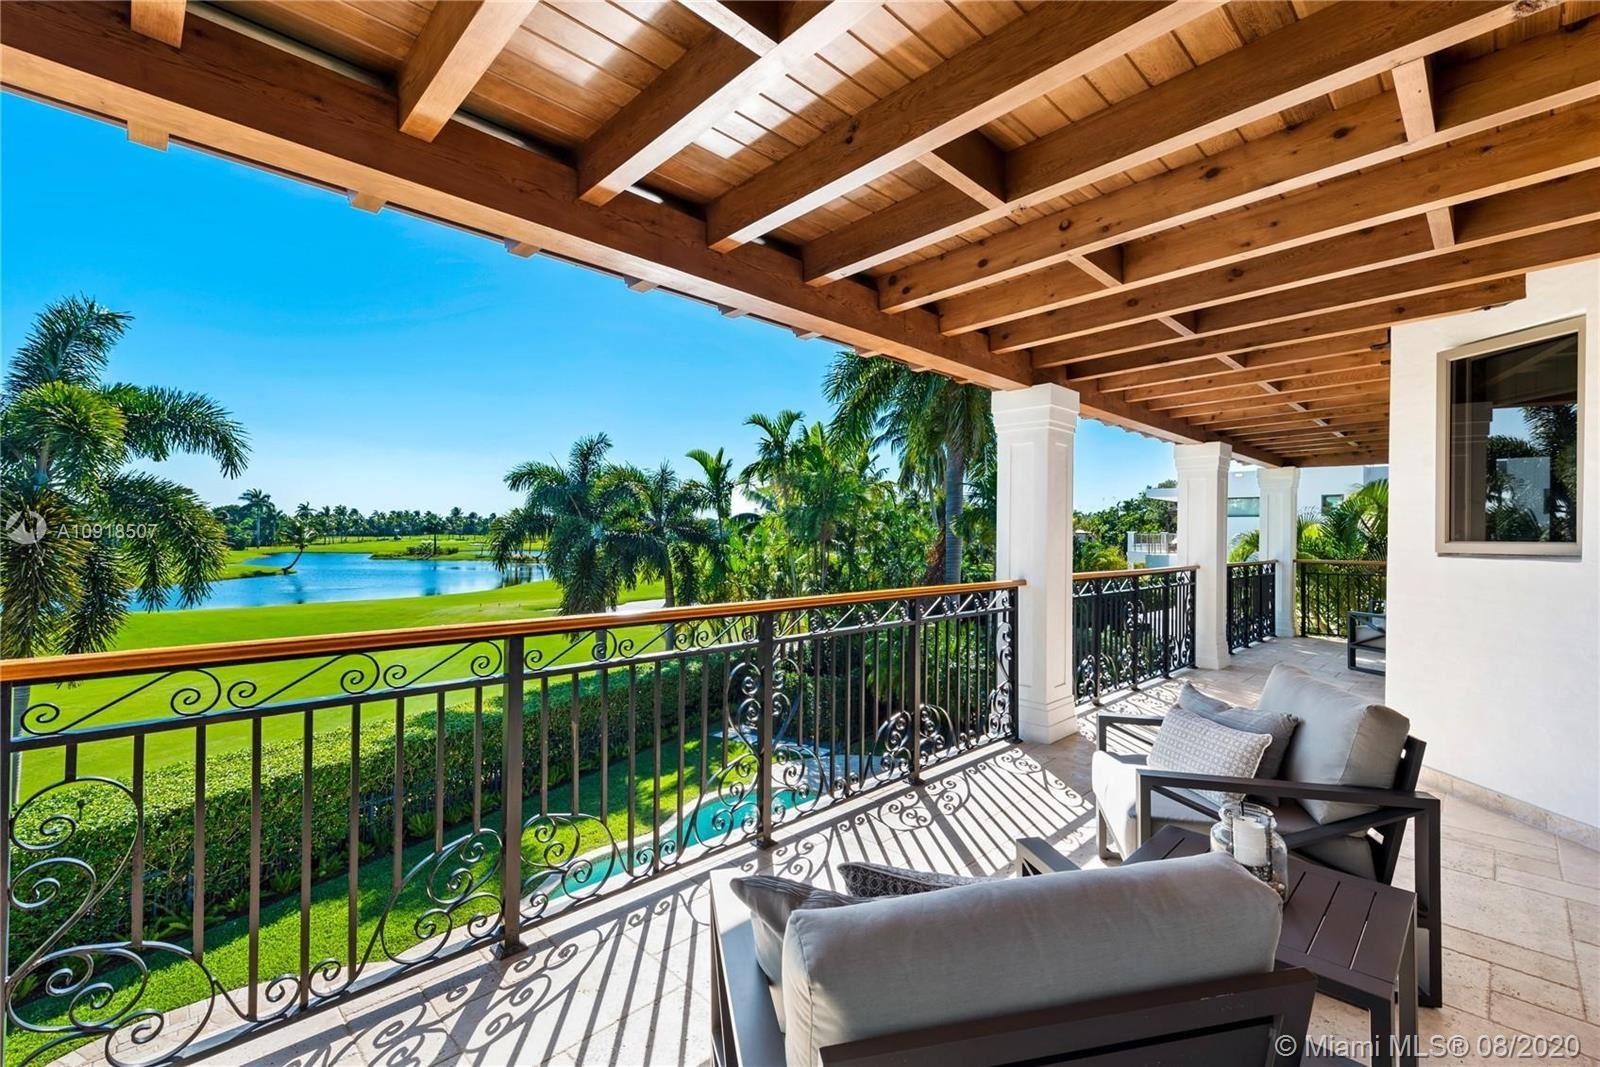 430 W 62 St, Miami Beach, FL 33140 - #: A10918507